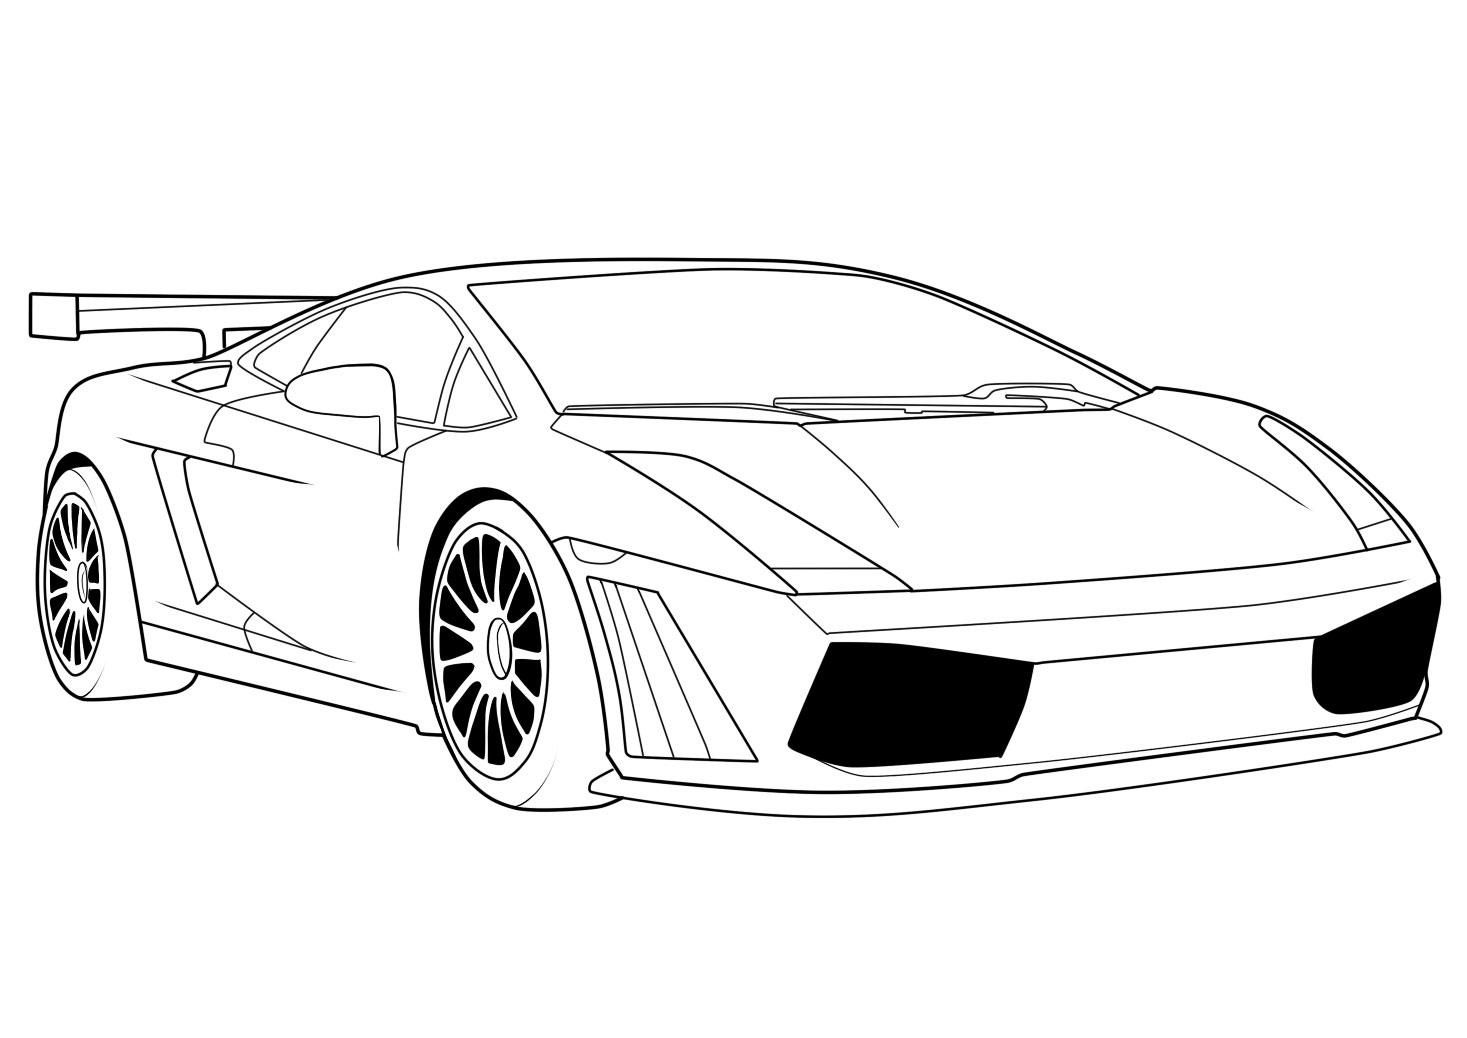 Lamborghini coloring pages to print coloring home for Lamborghini coloring pages to print